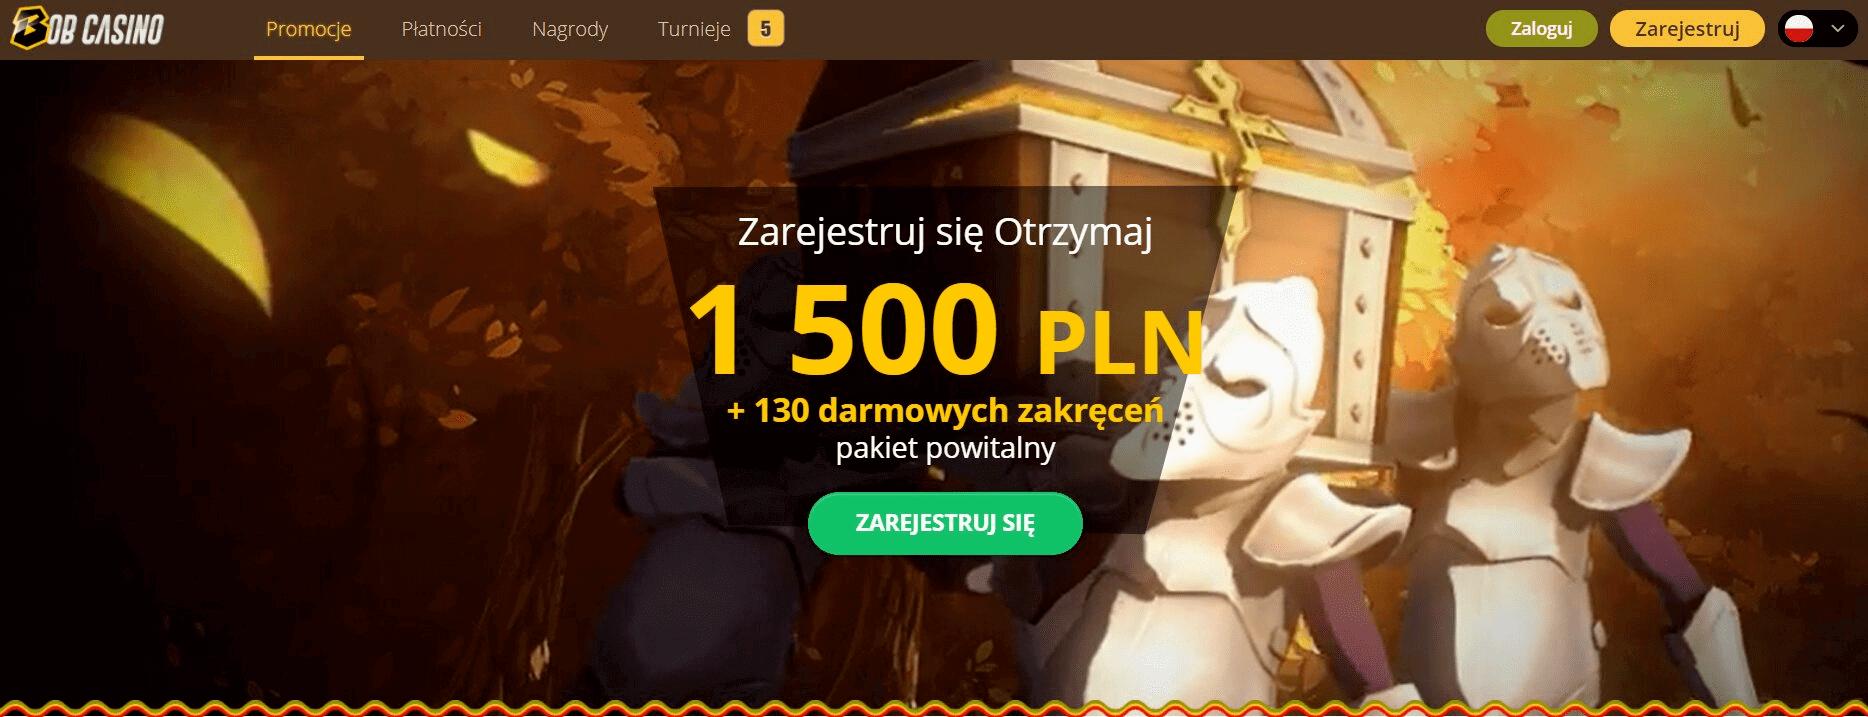 bob casino bonusy darmowe spiny screenshot